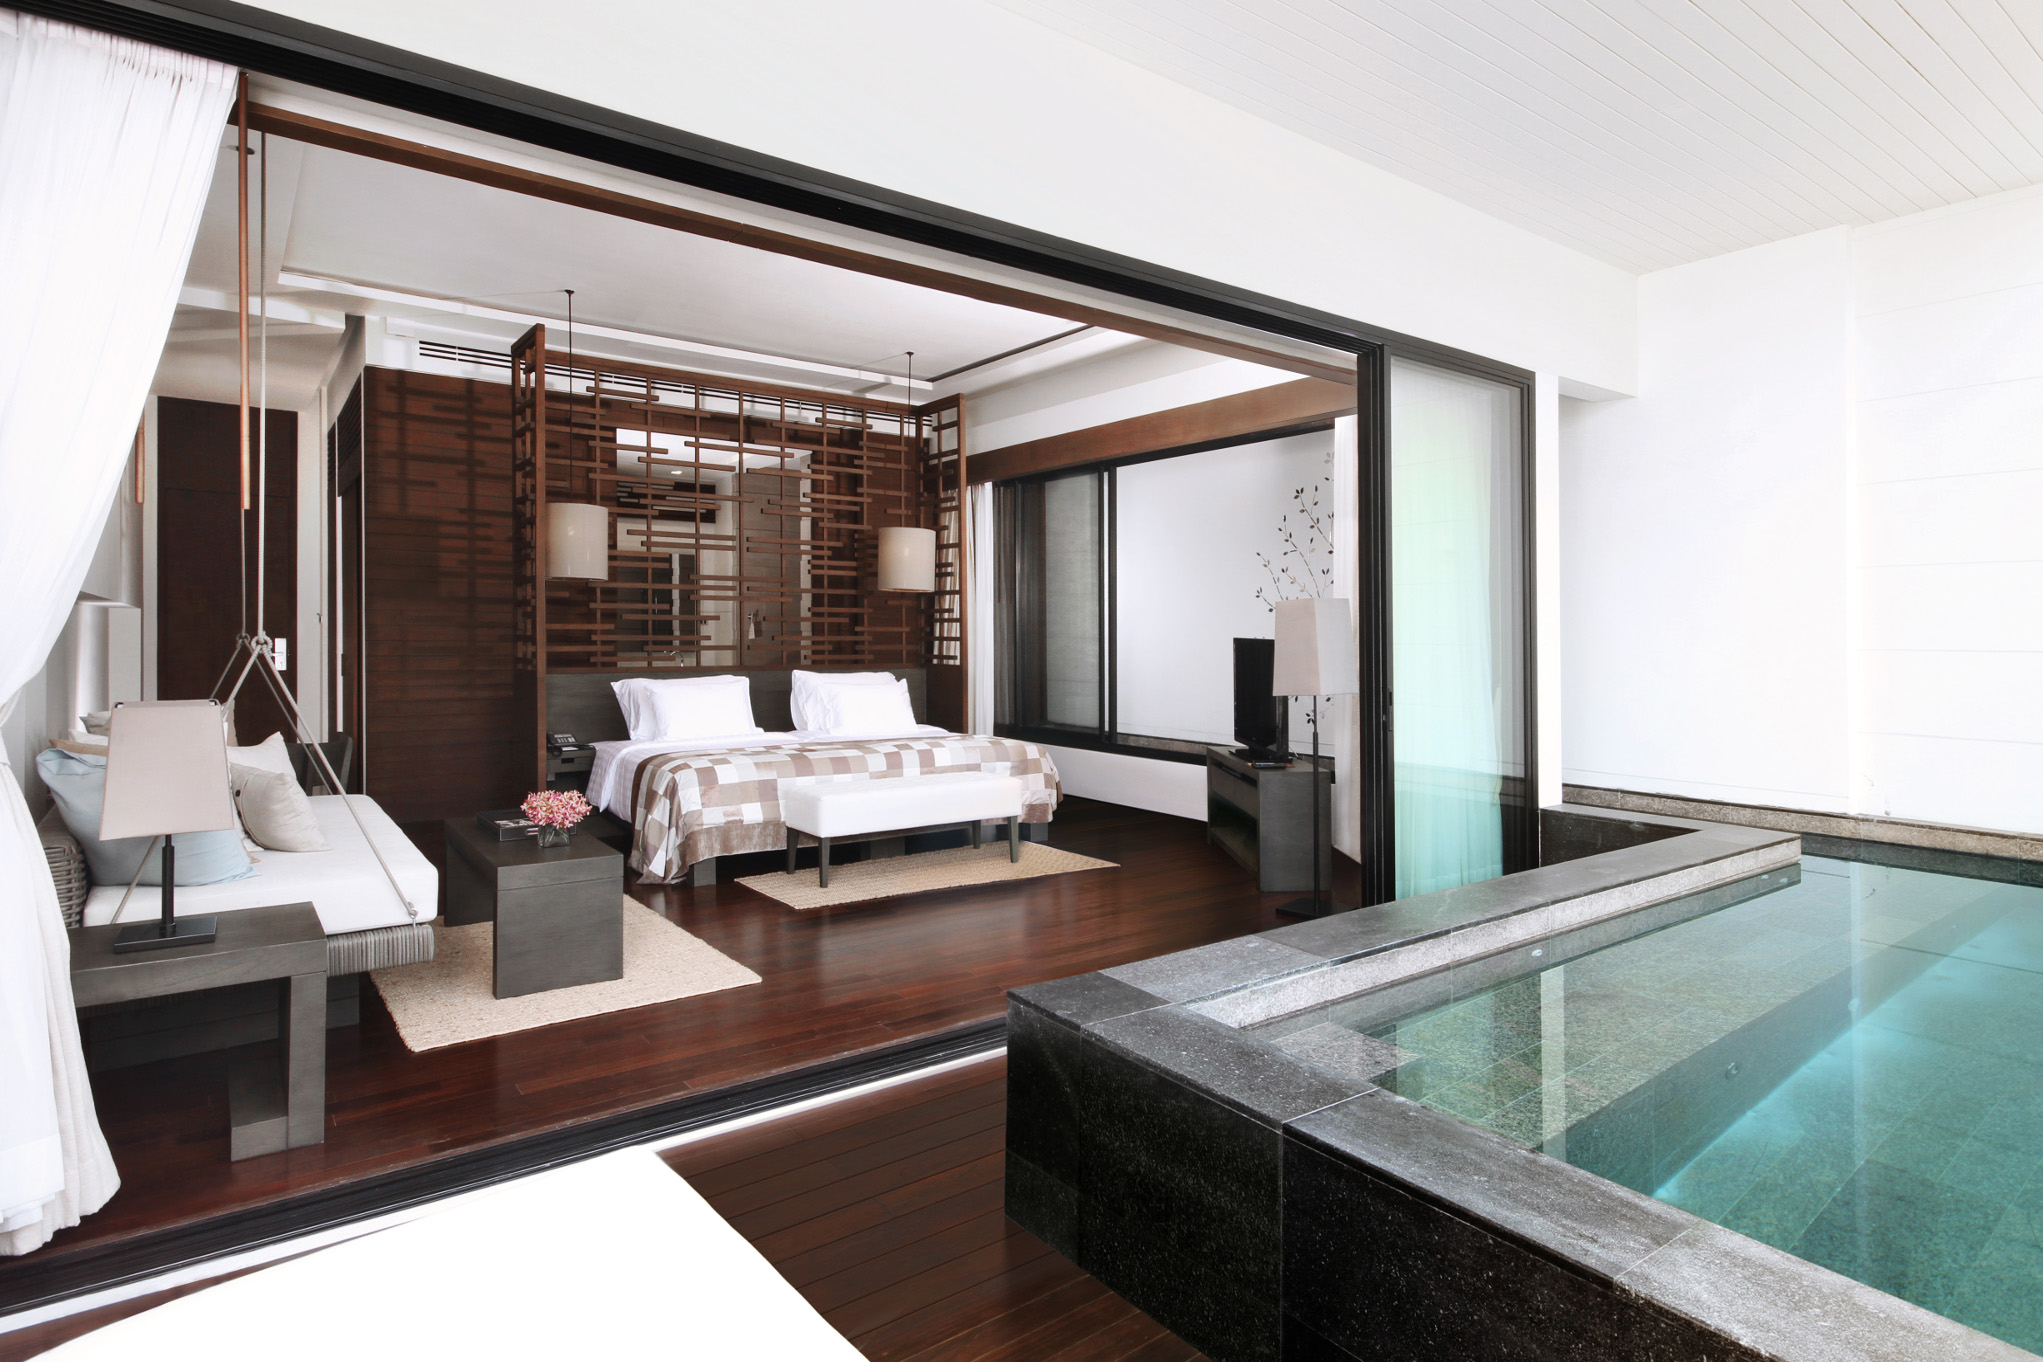 Pauschalangebote thailand reisen reber - The sky pool a deluxe adventure ...